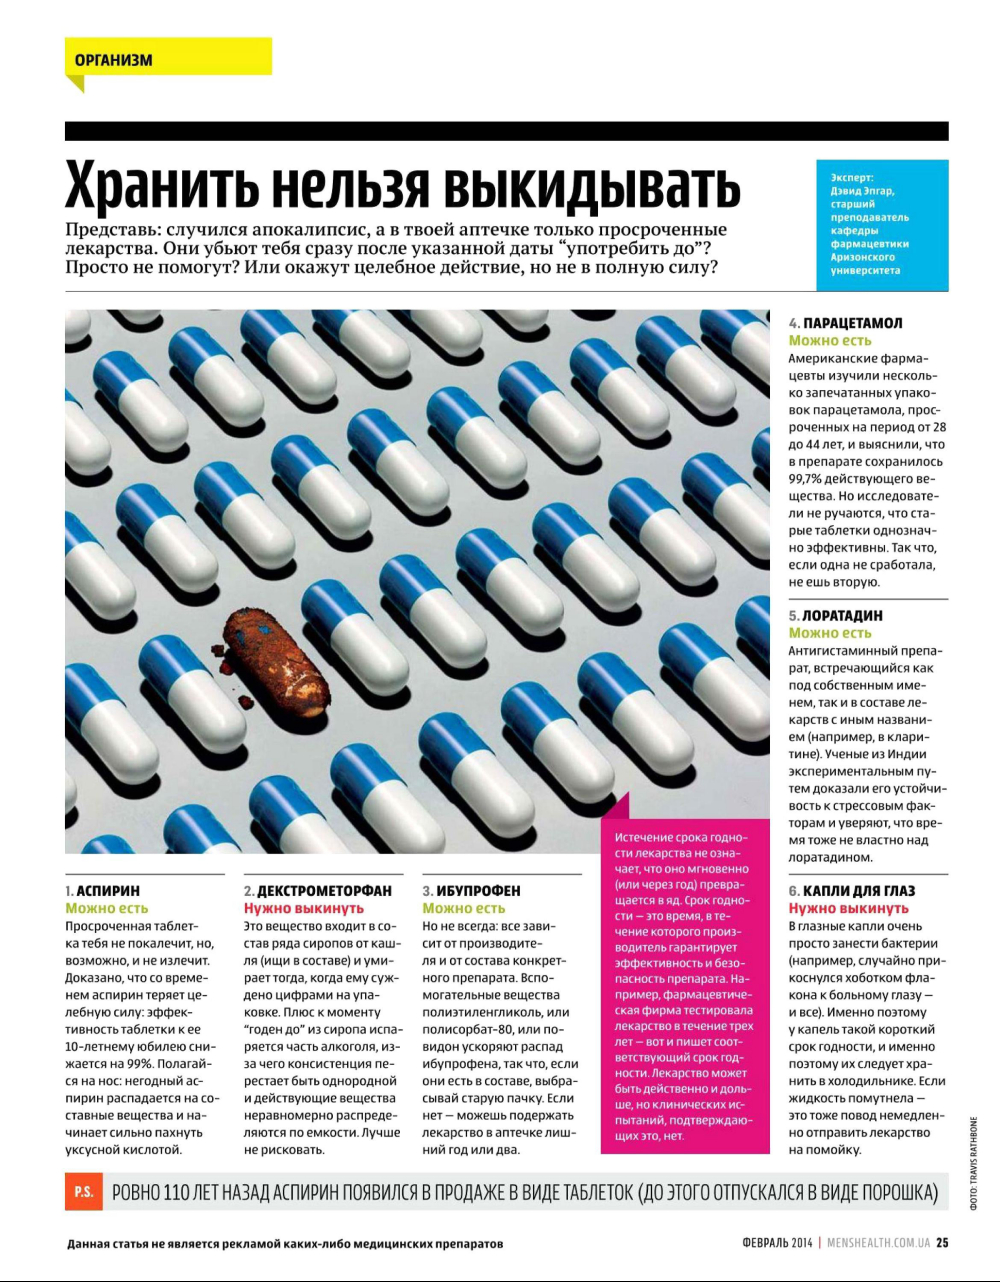 http://i5.imageban.ru/out/2014/01/15/25673899c822262c835d6a5e19046810.jpg